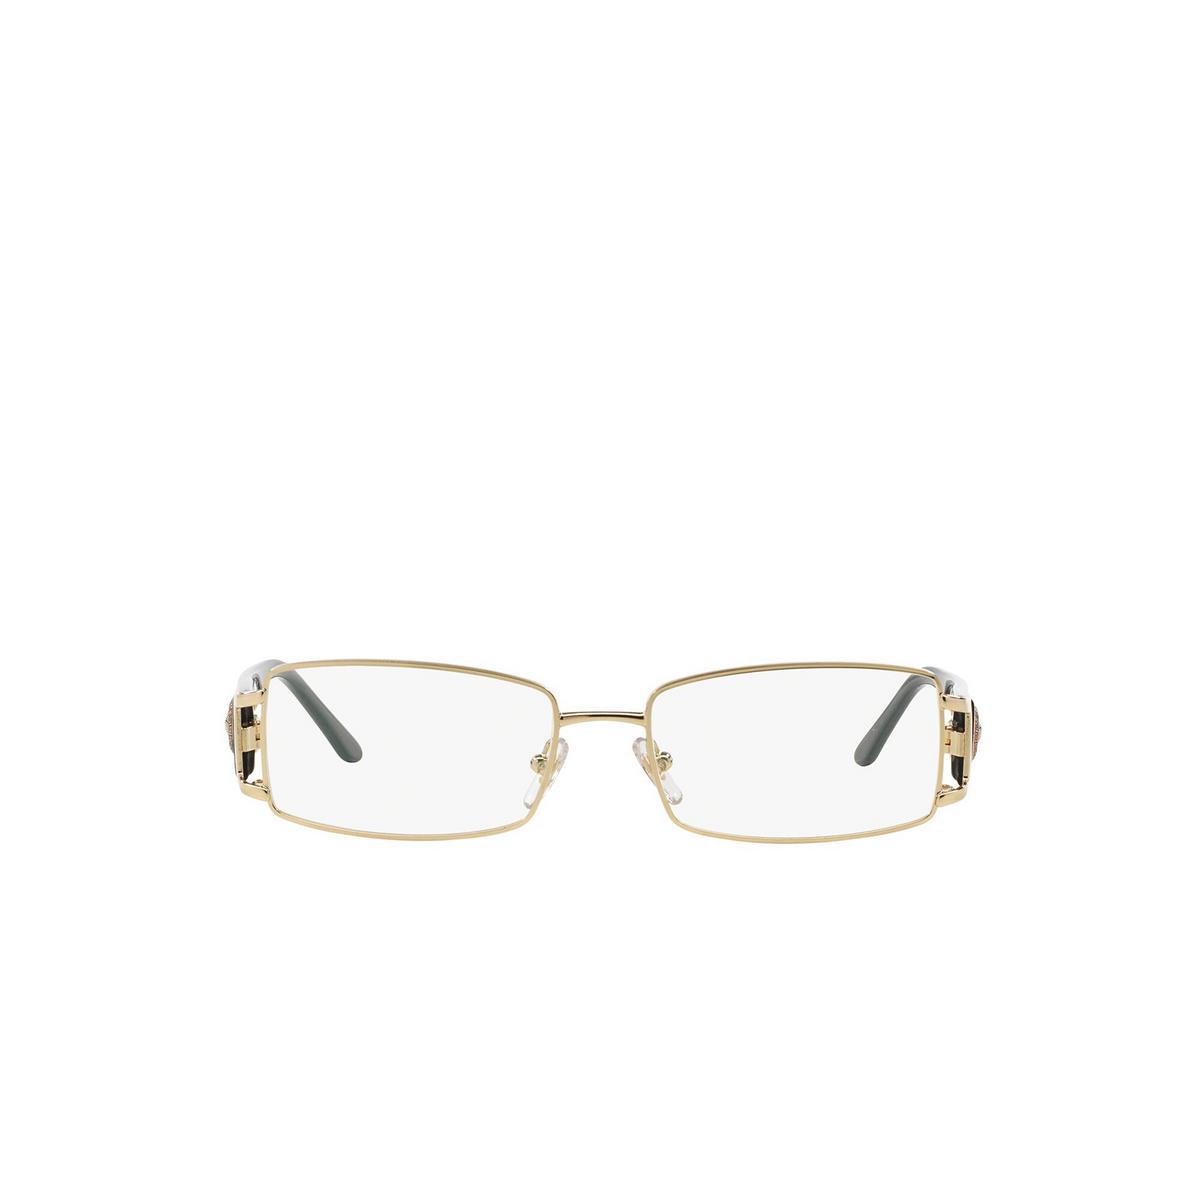 Versace® Rectangle Eyeglasses: VE1163M color Pale Gold 1252 - front view.